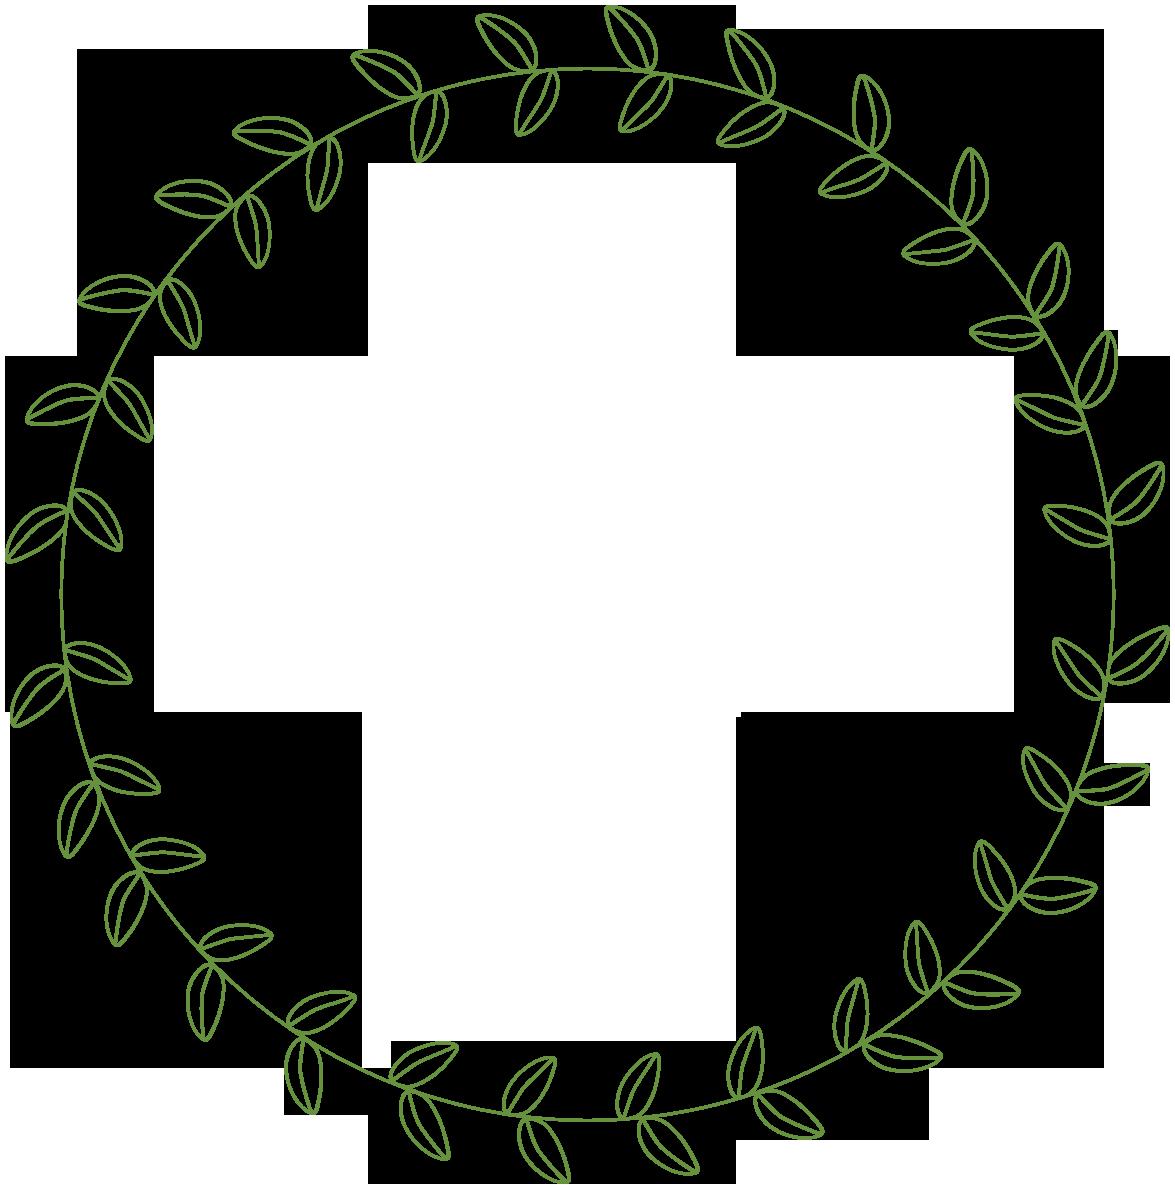 Rustic Wreath Clipart - Clipart Kid